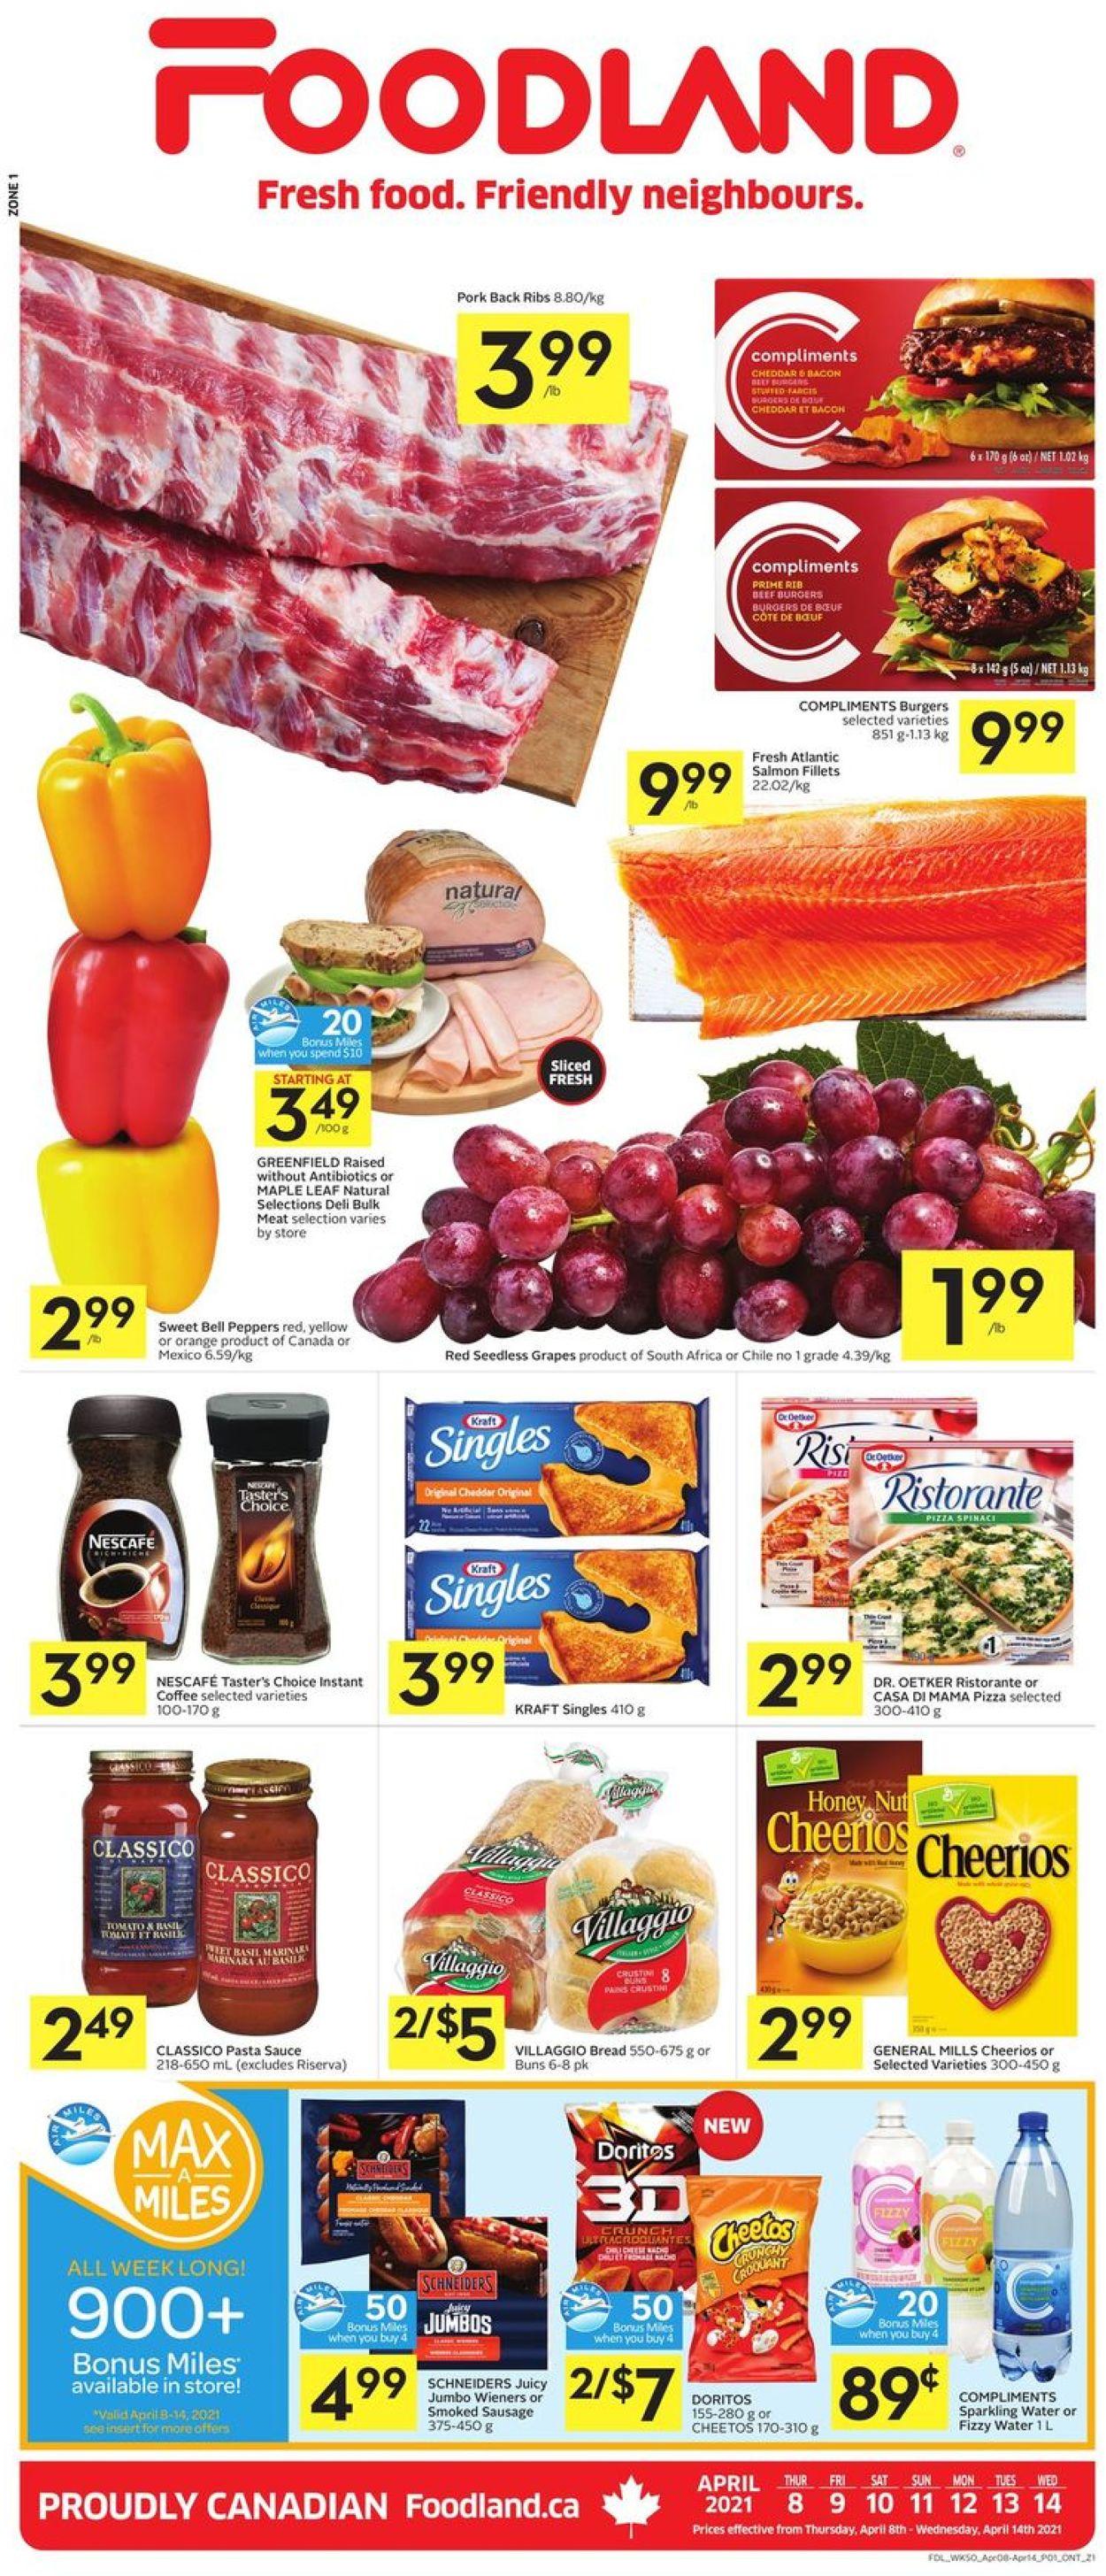 Foodland Flyer - 04/08-04/14/2021